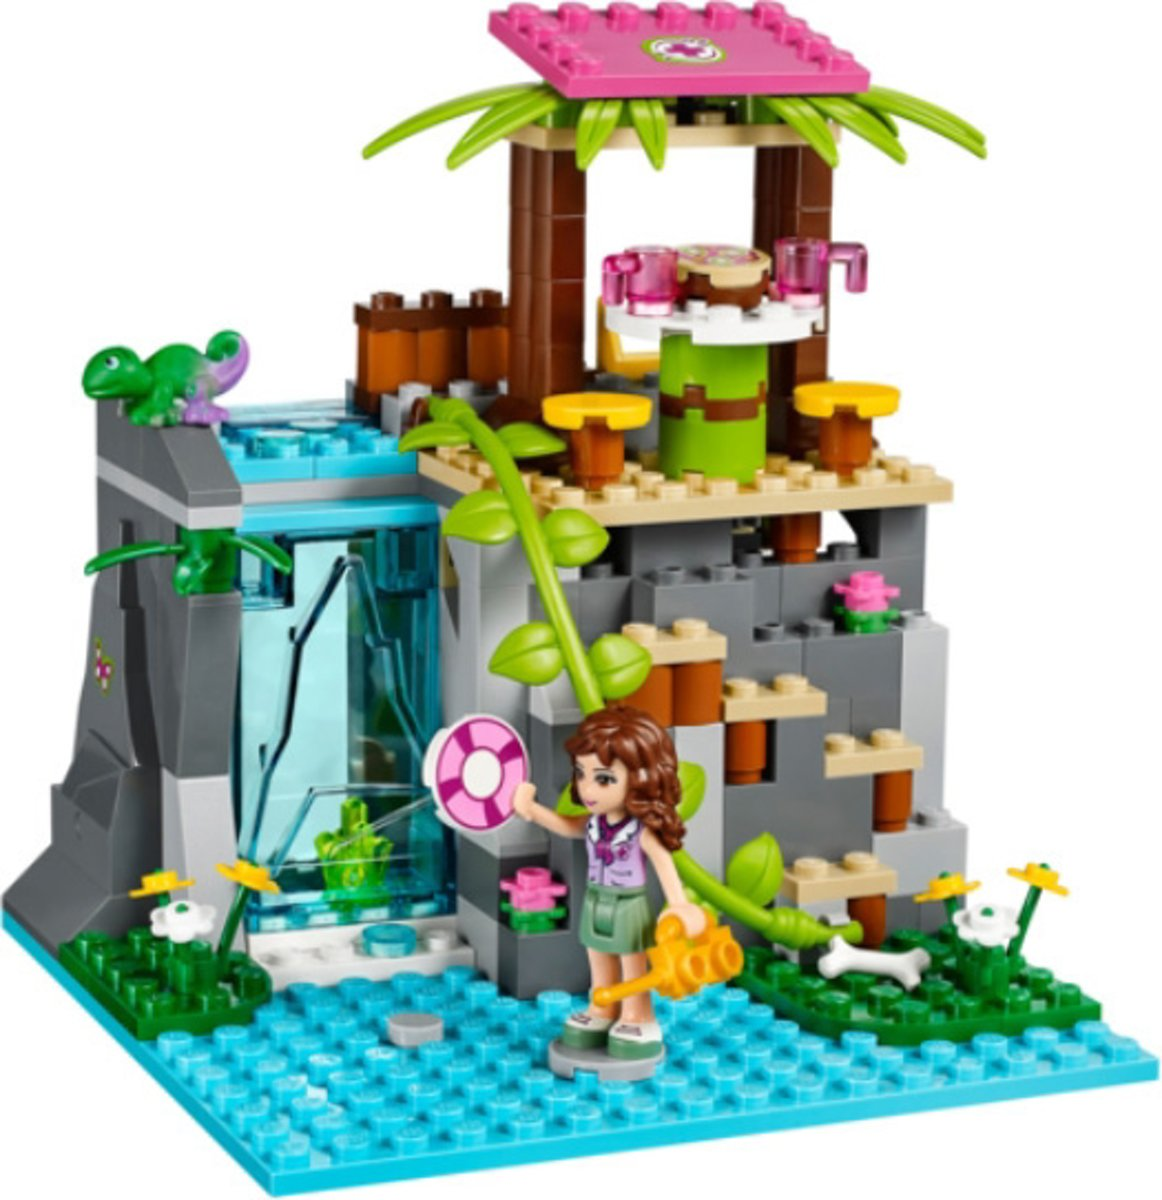 Bolcom Lego Friends Junglewaterval Reddingsactie 41033 Lego